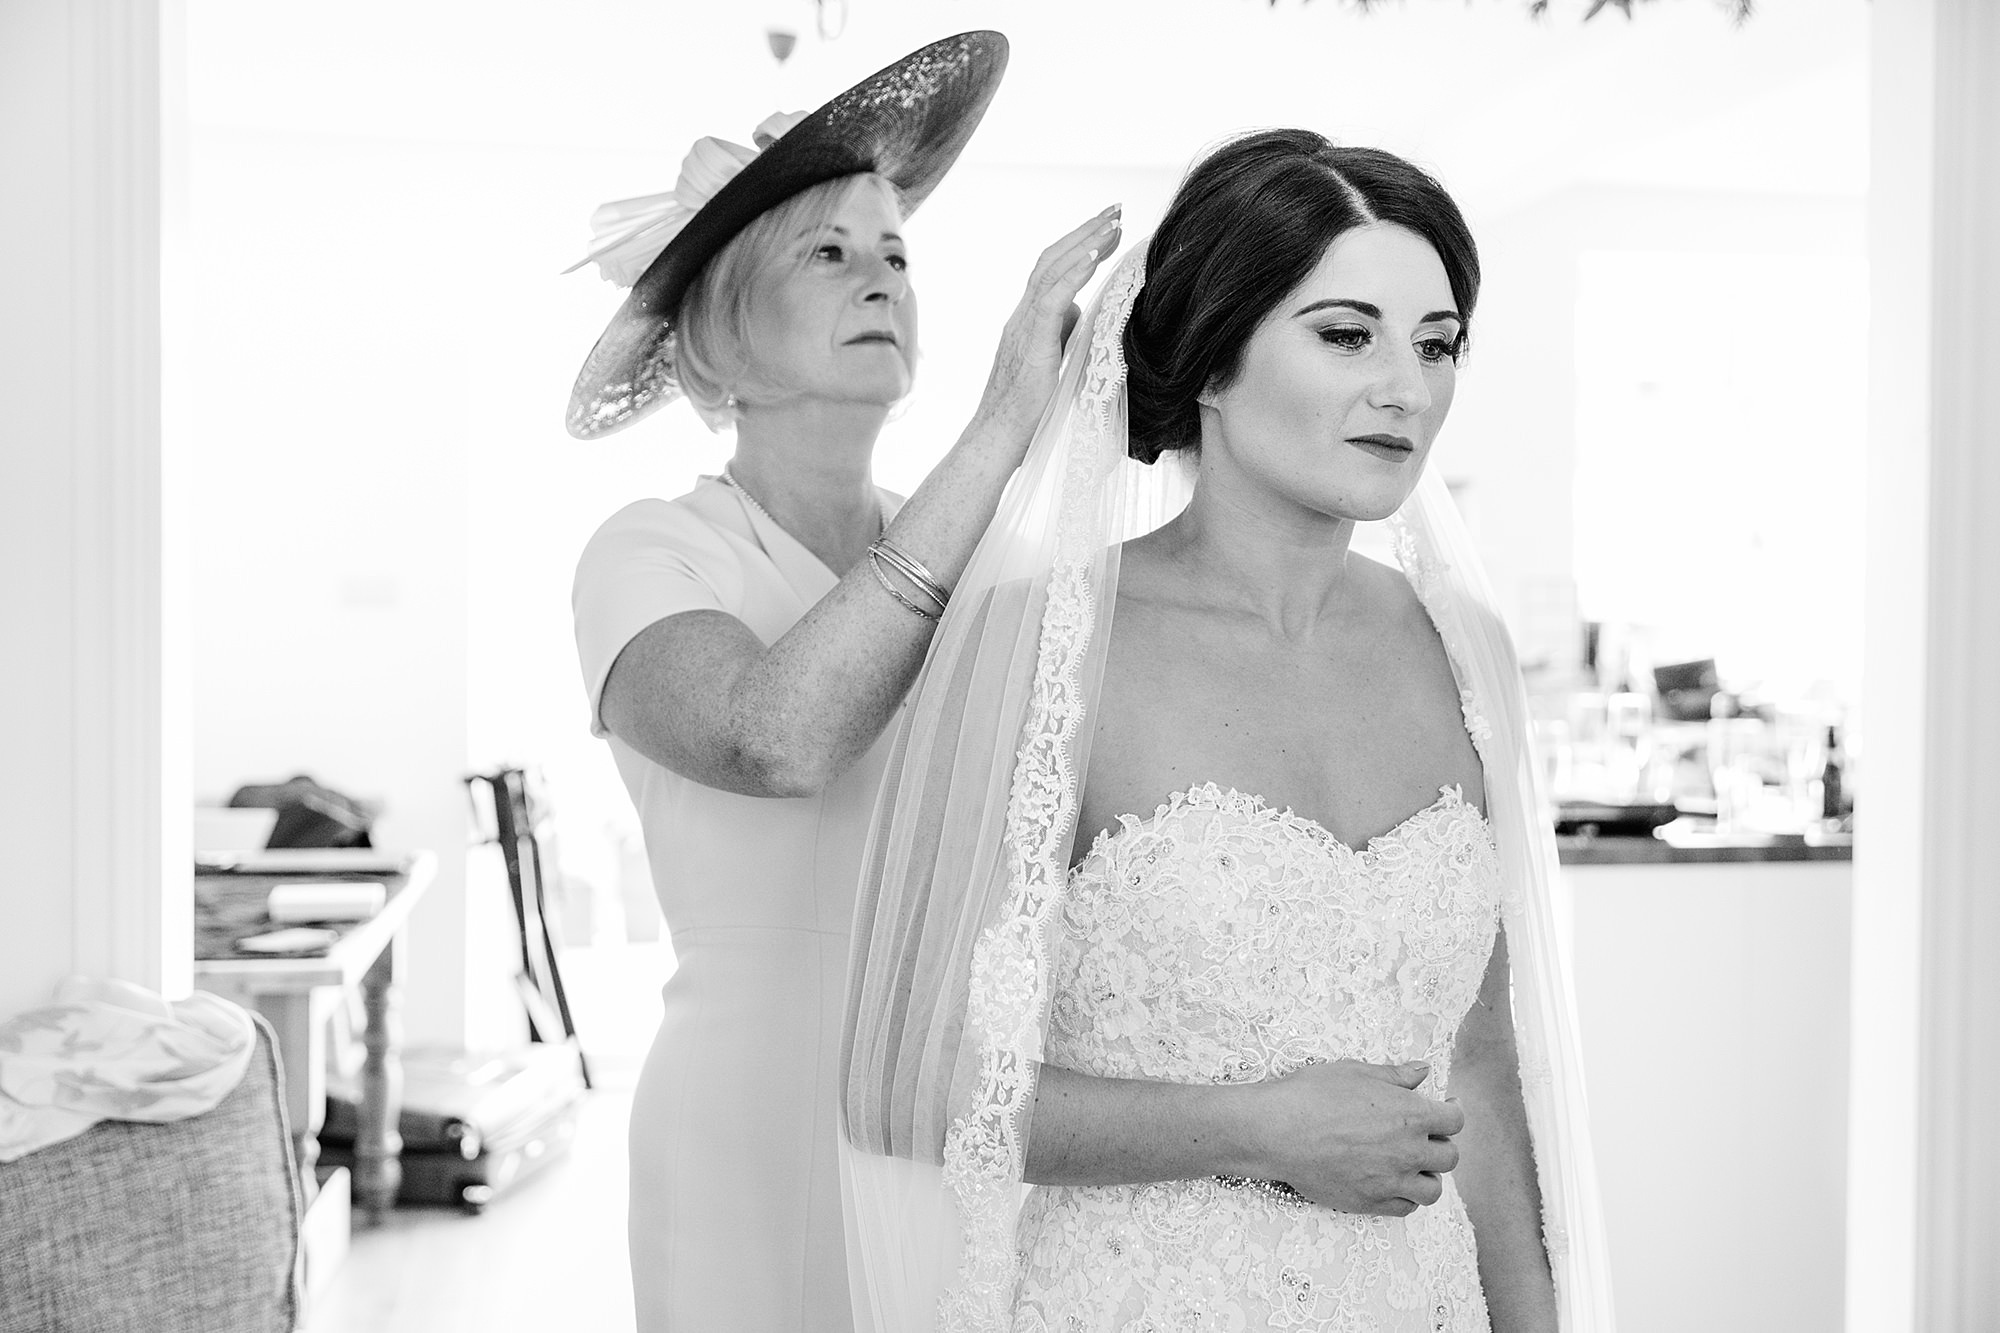 Lillibrooke Manor wedding mother of bride puts on bride's veil